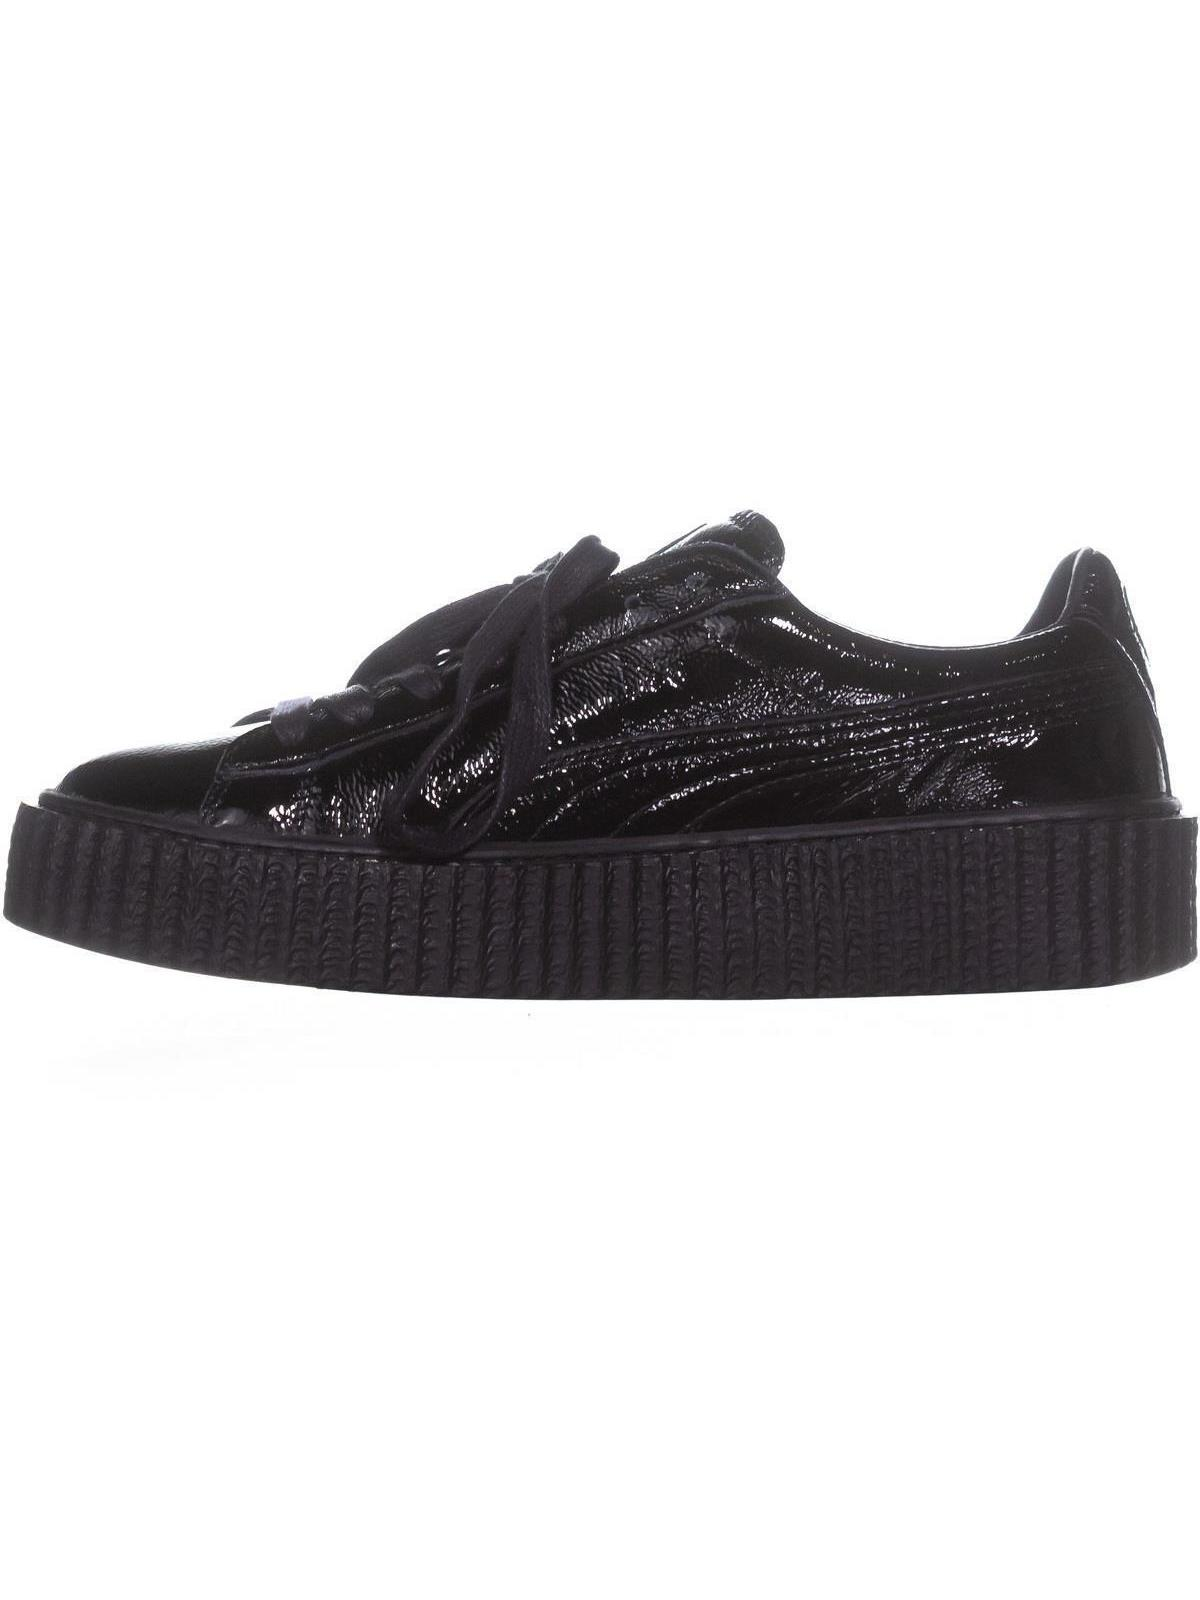 e2e2ba199a7eaf PUMA - Puma Women s Creeper Wrinkled Patent Black   Ankle-High Leather  Fashion Sneaker - 6.5M - Walmart.com